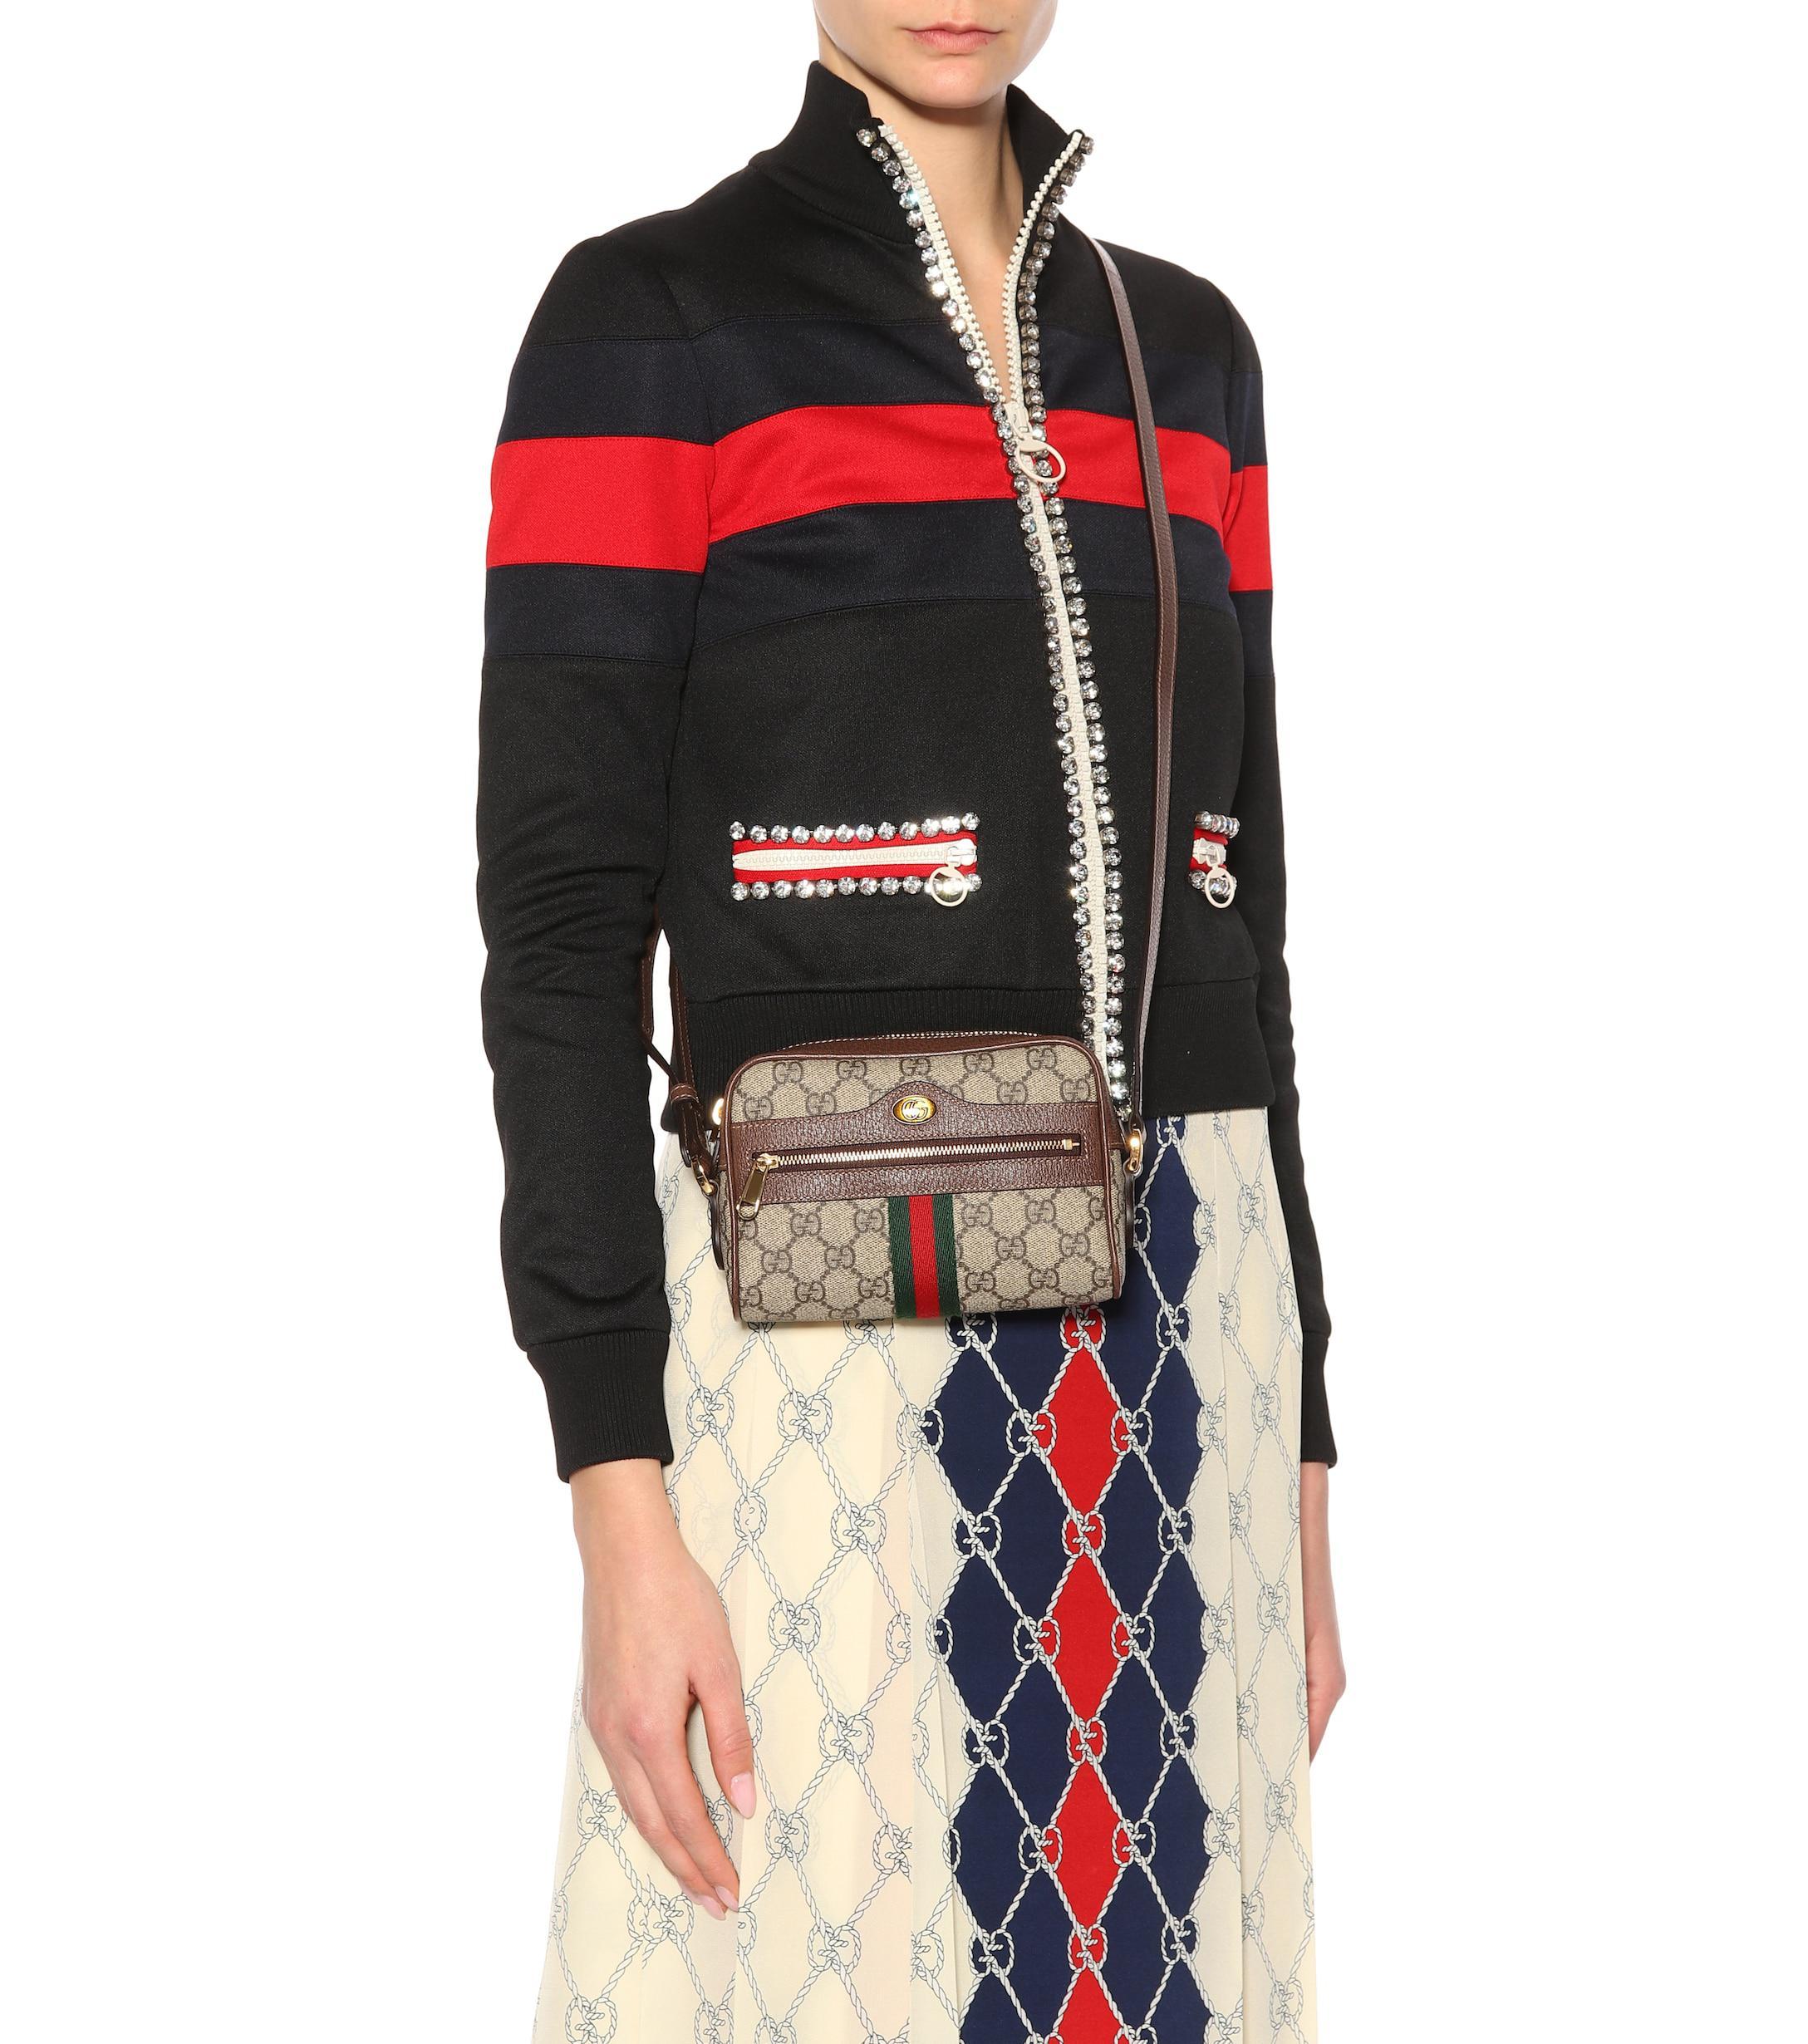 Gucci Multicolor Ophidia Gg Supreme Mini Shoulder Bag Lyst View Fullscreen